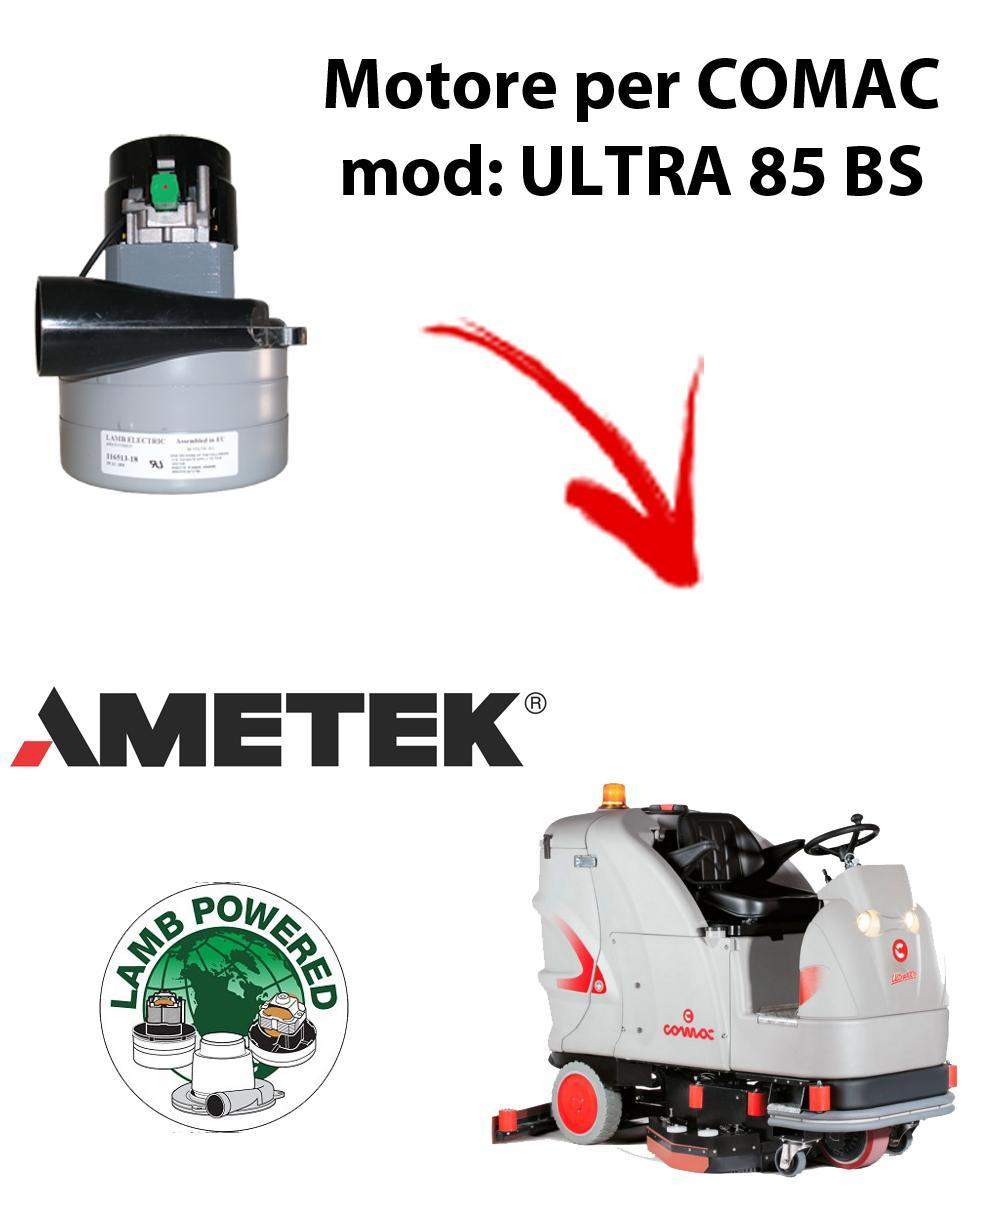 ULTRA 85 BS Saugmotor AMETEK für scheuersaugmaschinen COMAC